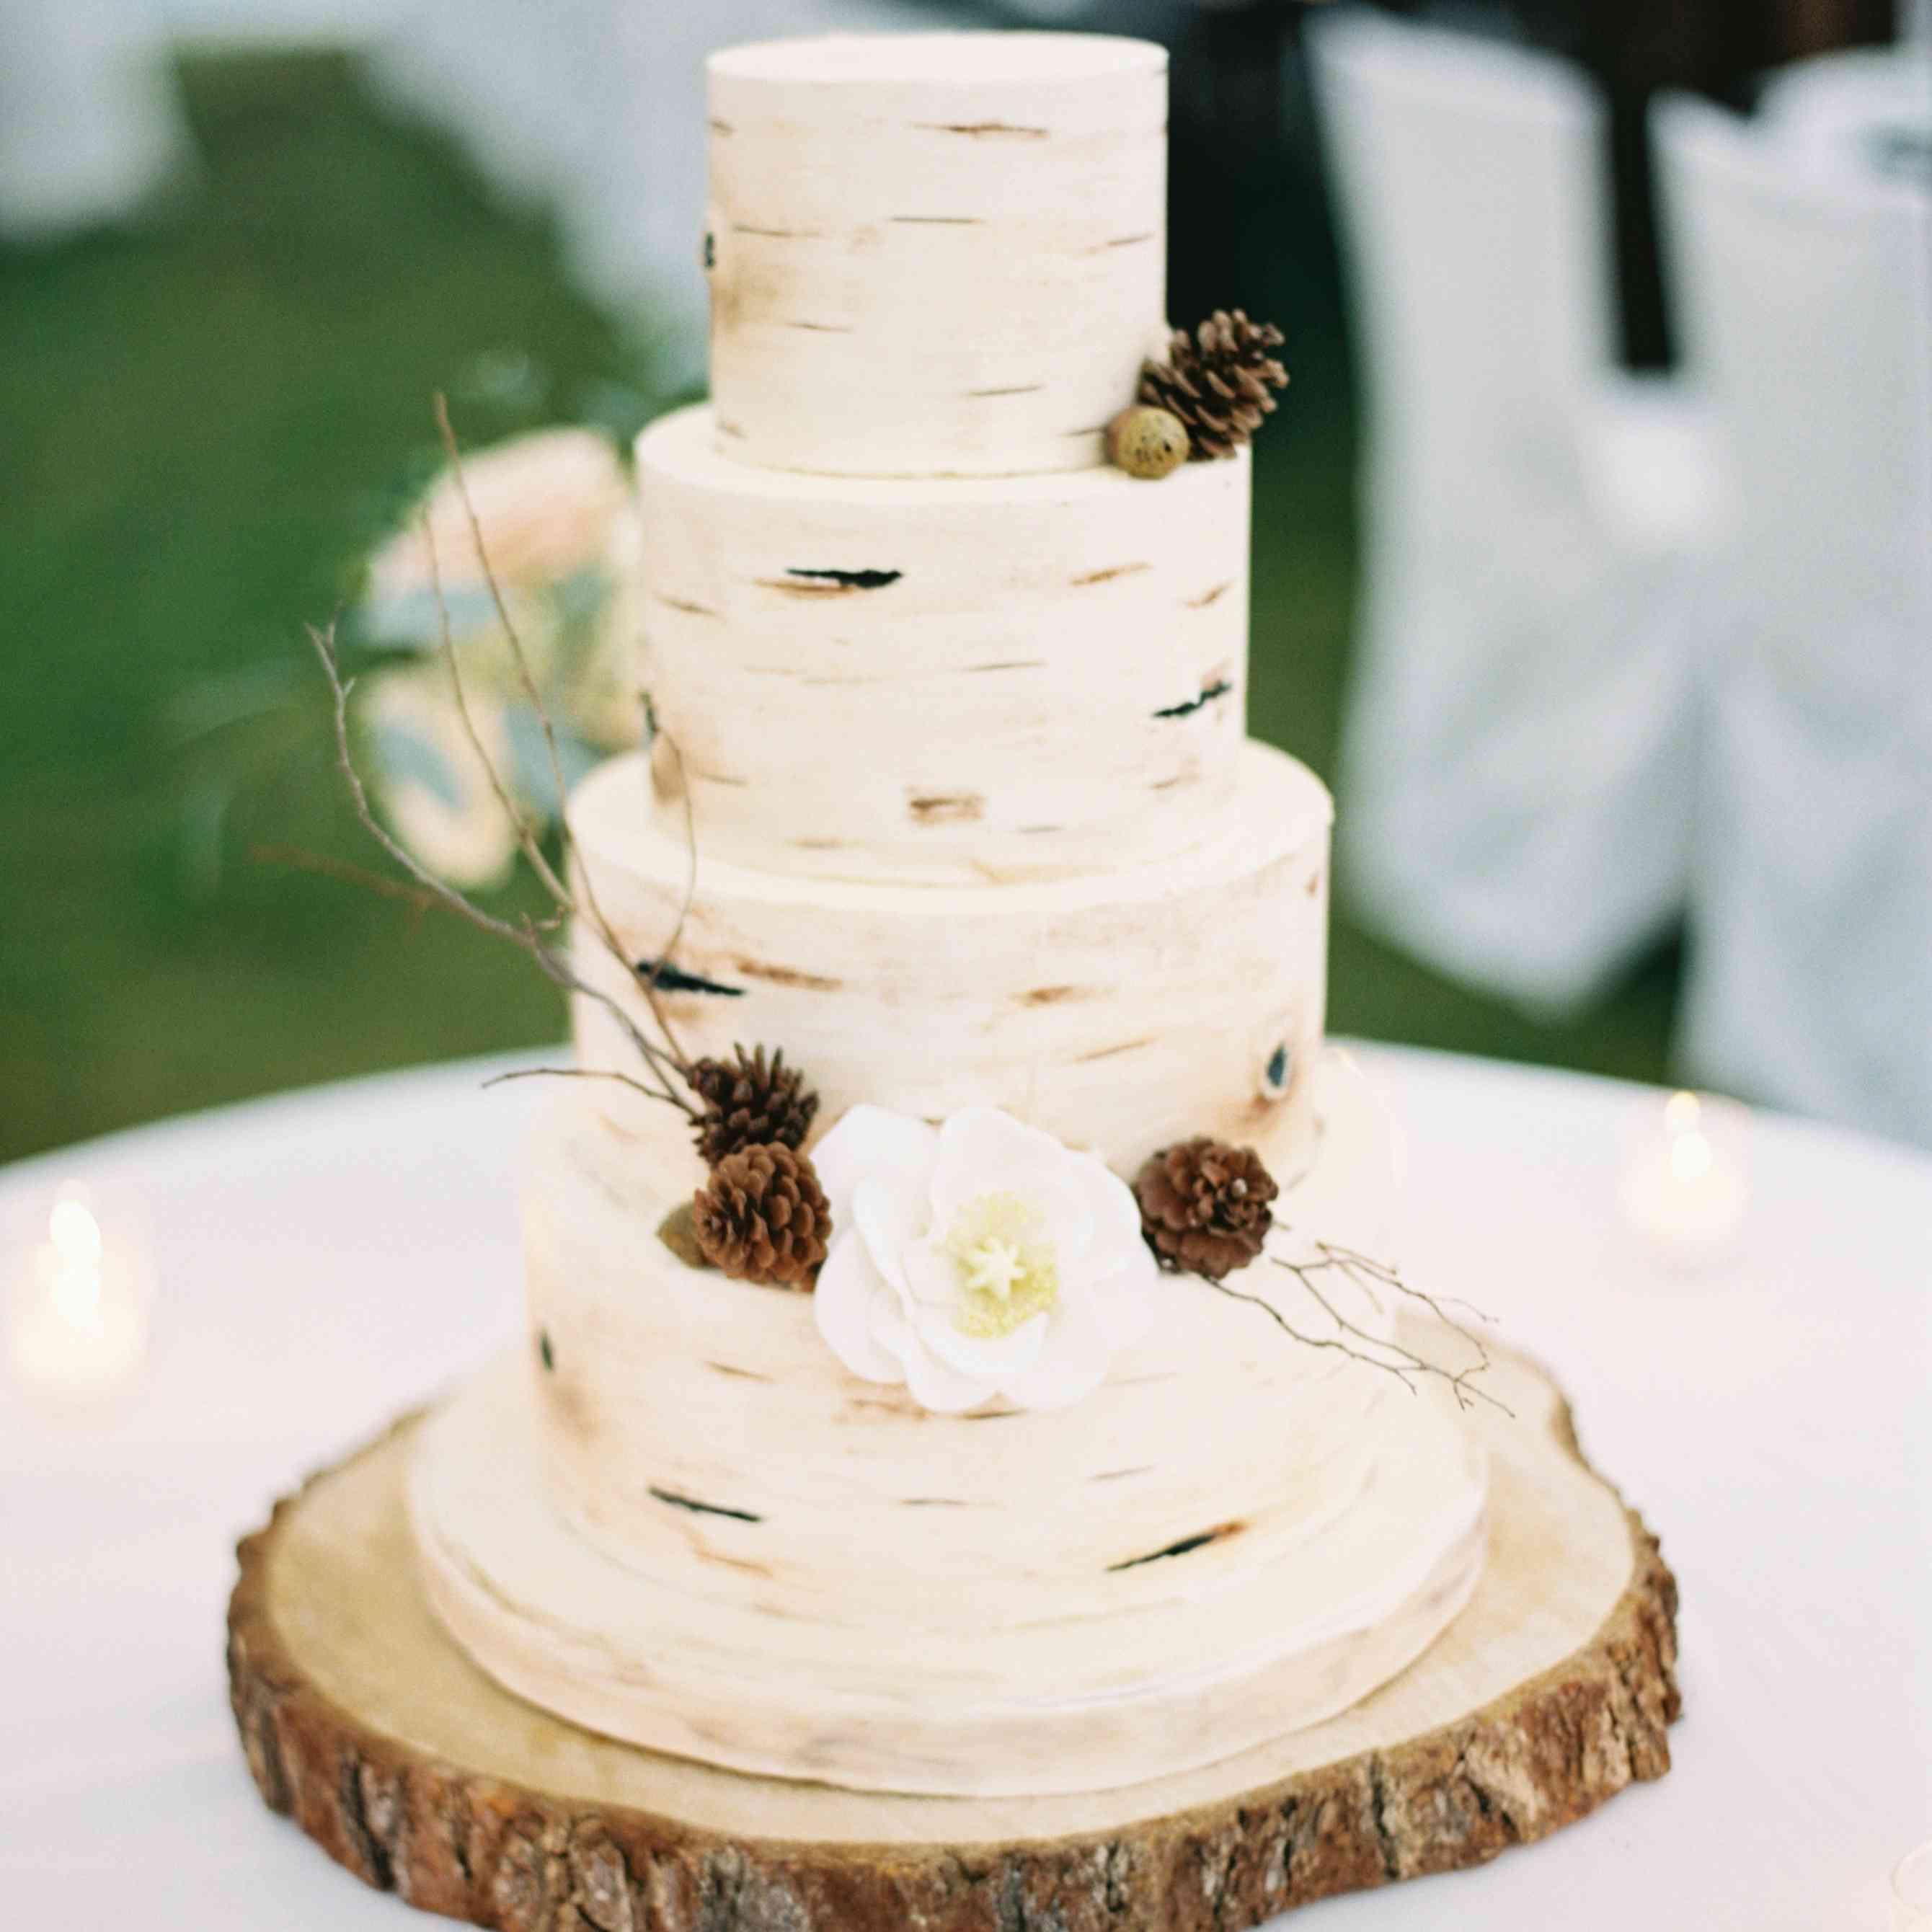 Wood-Inspired Wedding Cake